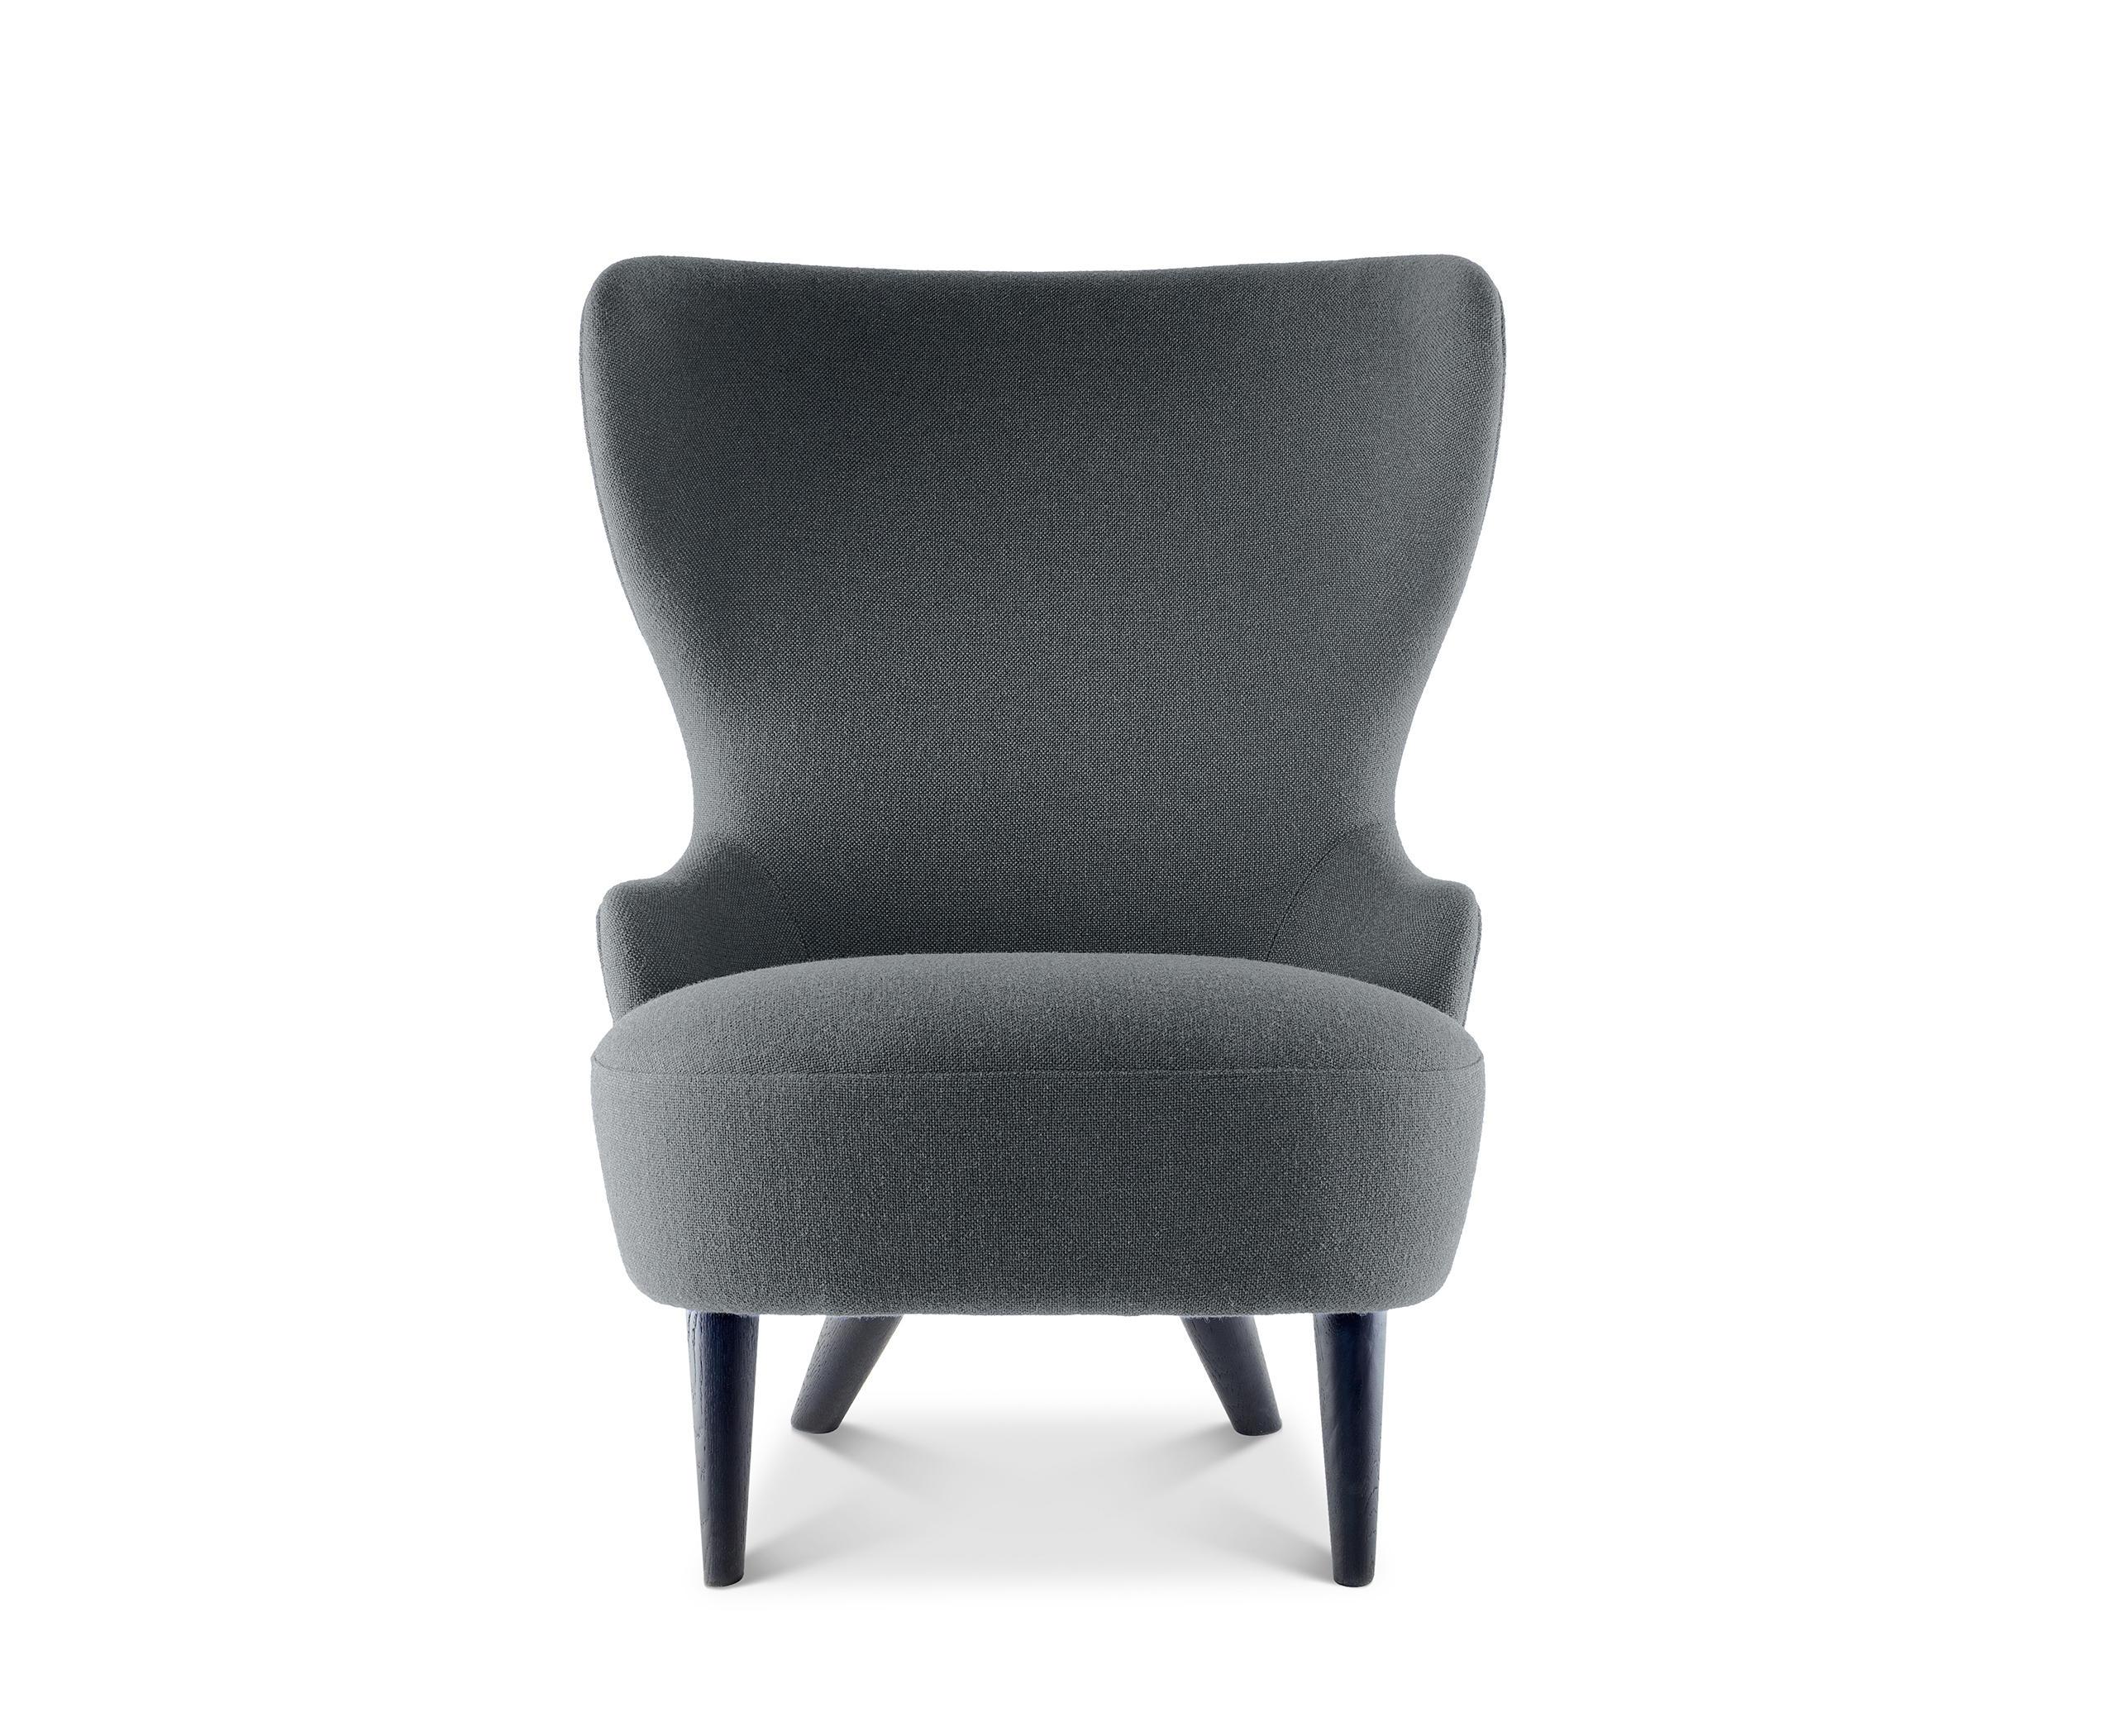 Micro Wingback Chair Black Leg Hallingdal 65 | Architonic